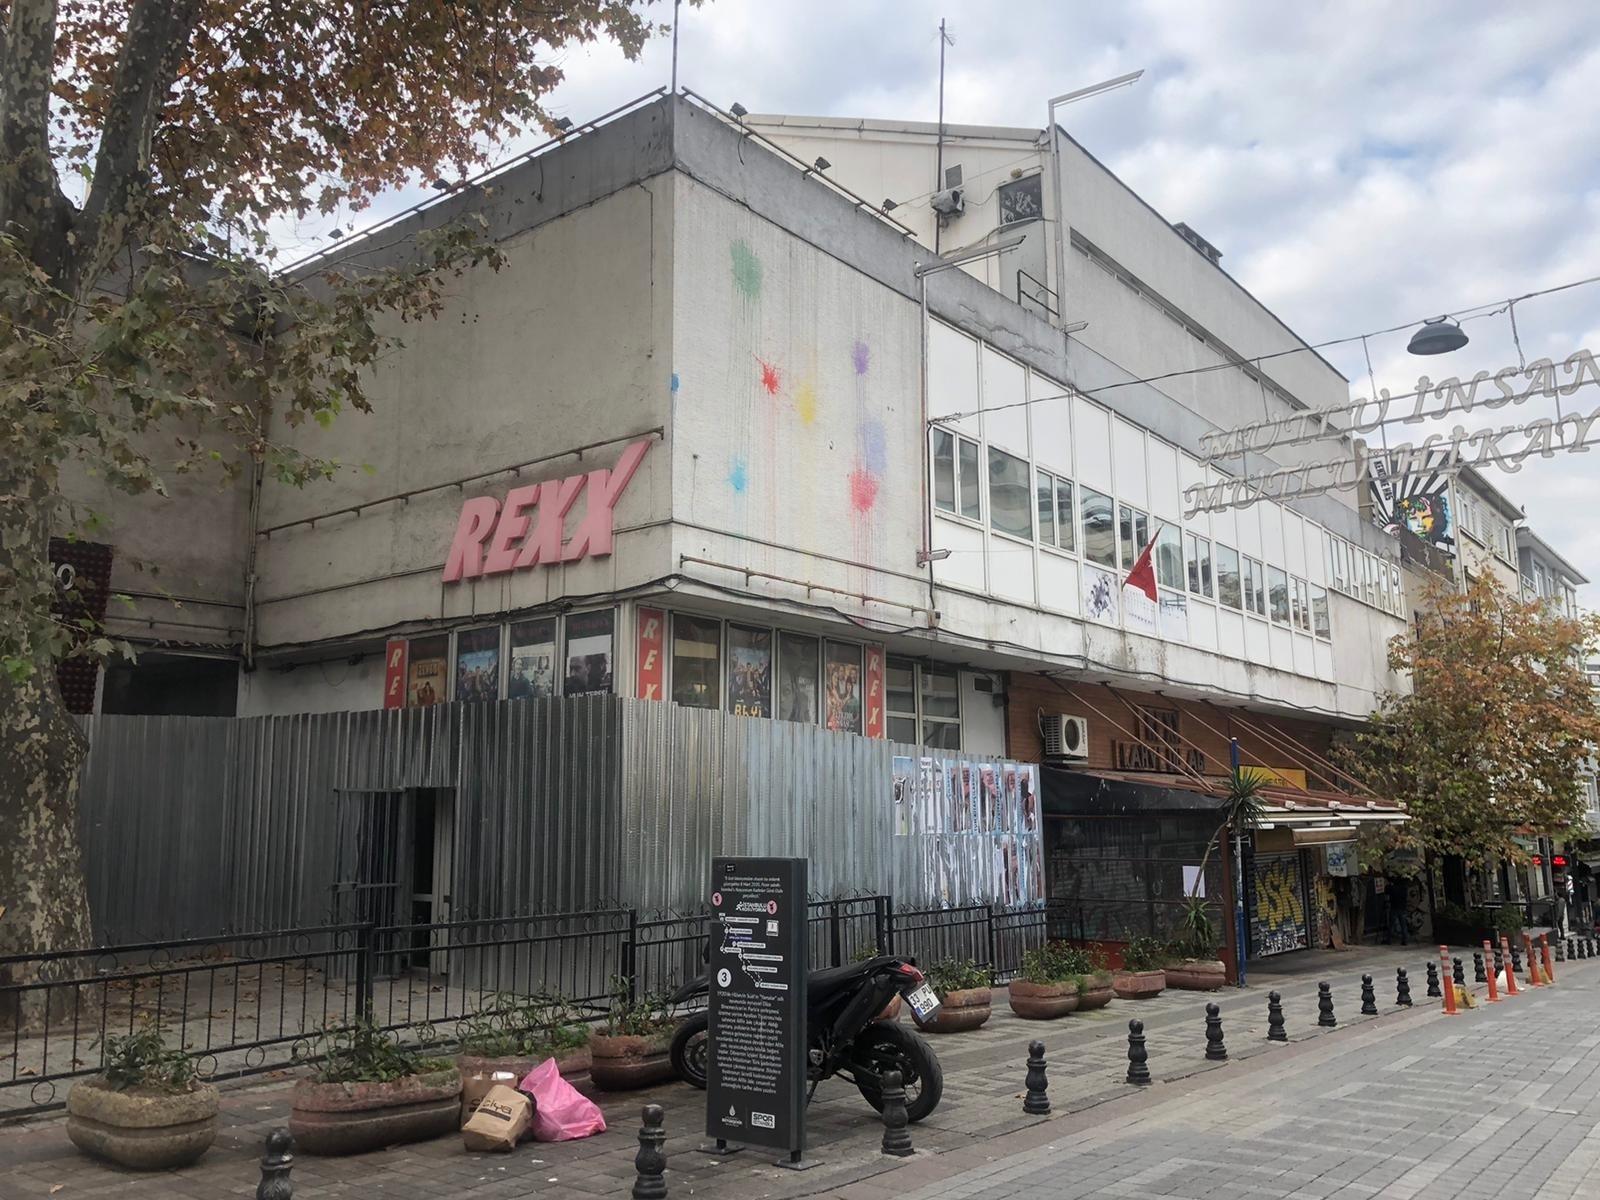 Metal sheets are seen around the Rexx Cinema in Kadıköy, Istanbul, Dec. 7, 2020. (DHA PHOTO)